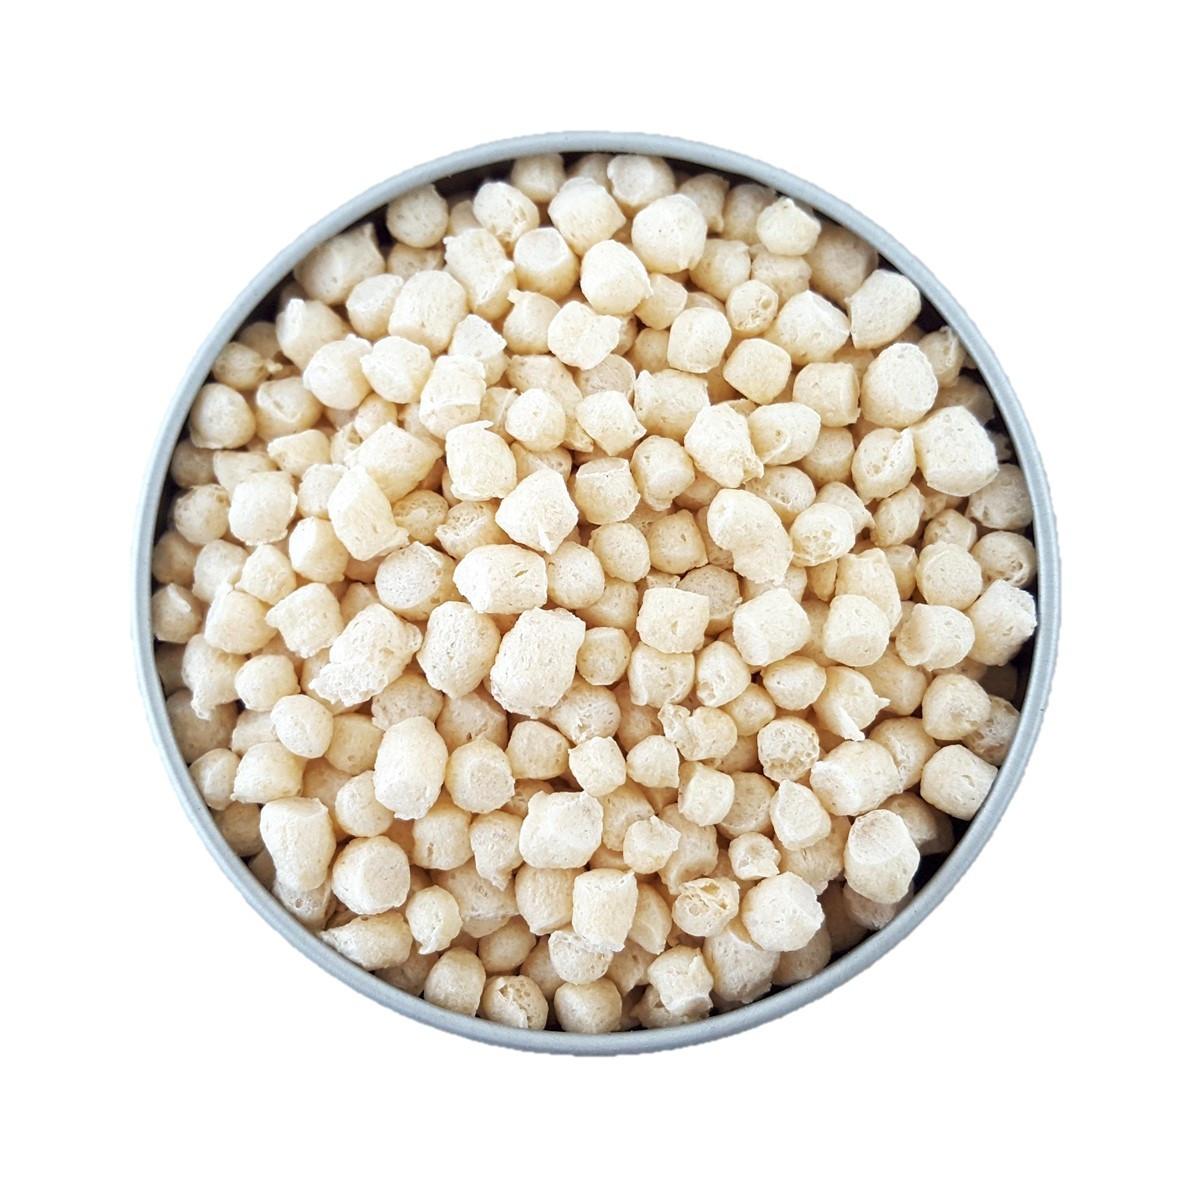 Organic Puffed Quinoa  Organic Quinoa Puffs Nature s Superfoods